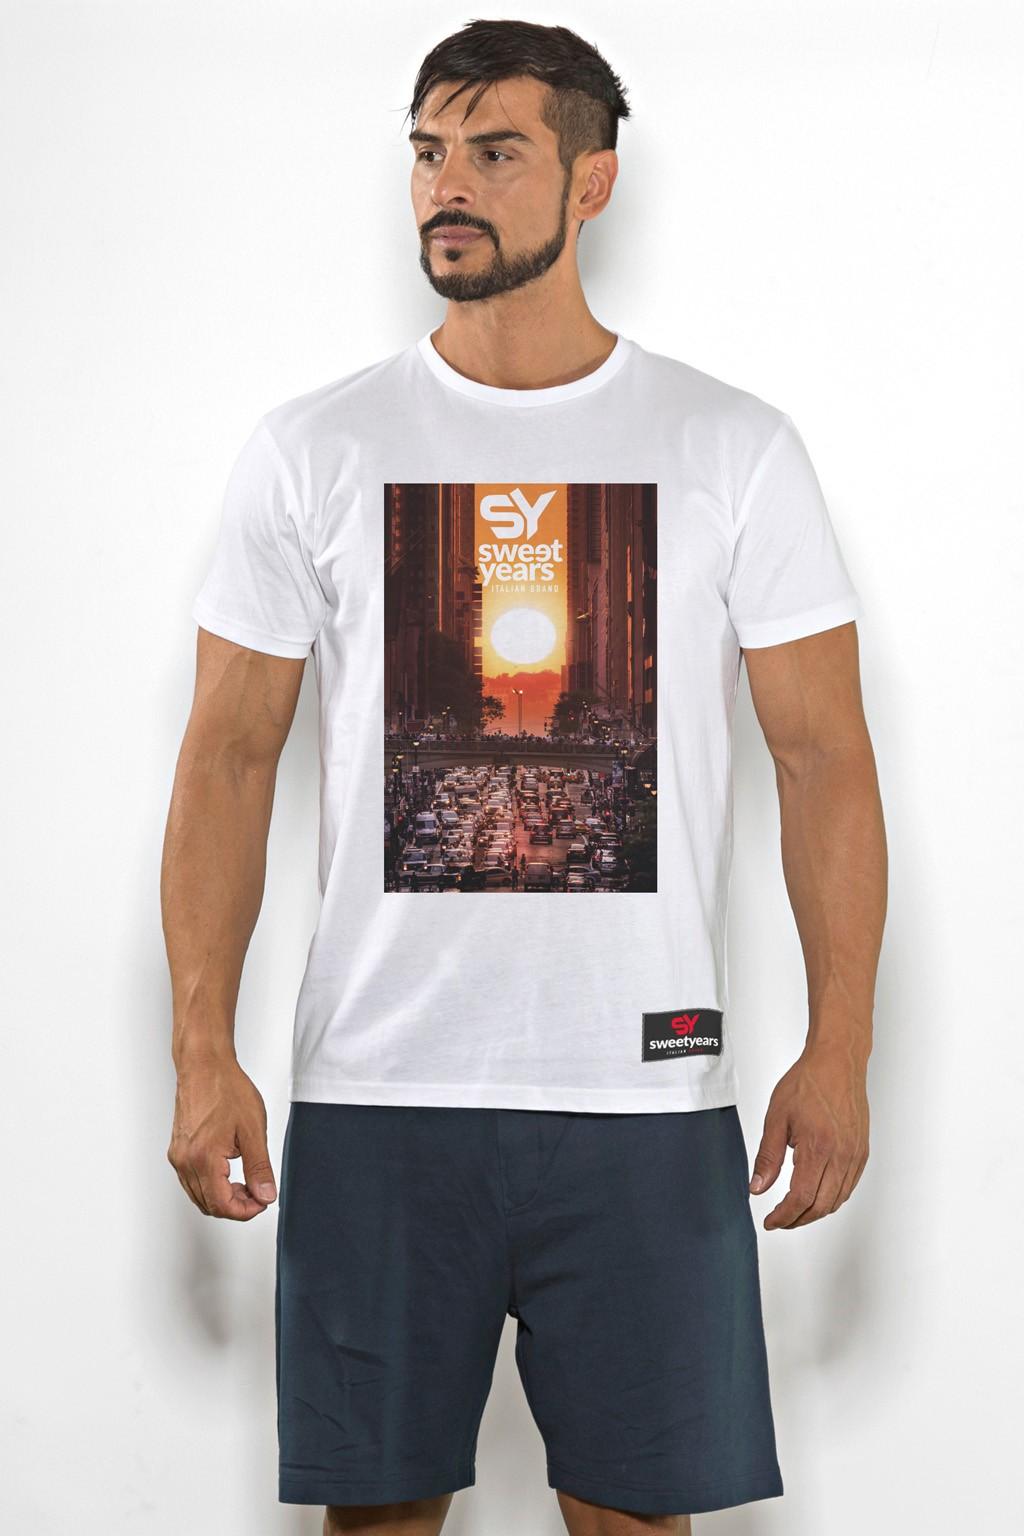 T-shirt uomo Sweet Years cotone tinta unita con stampa tramonto sul petto